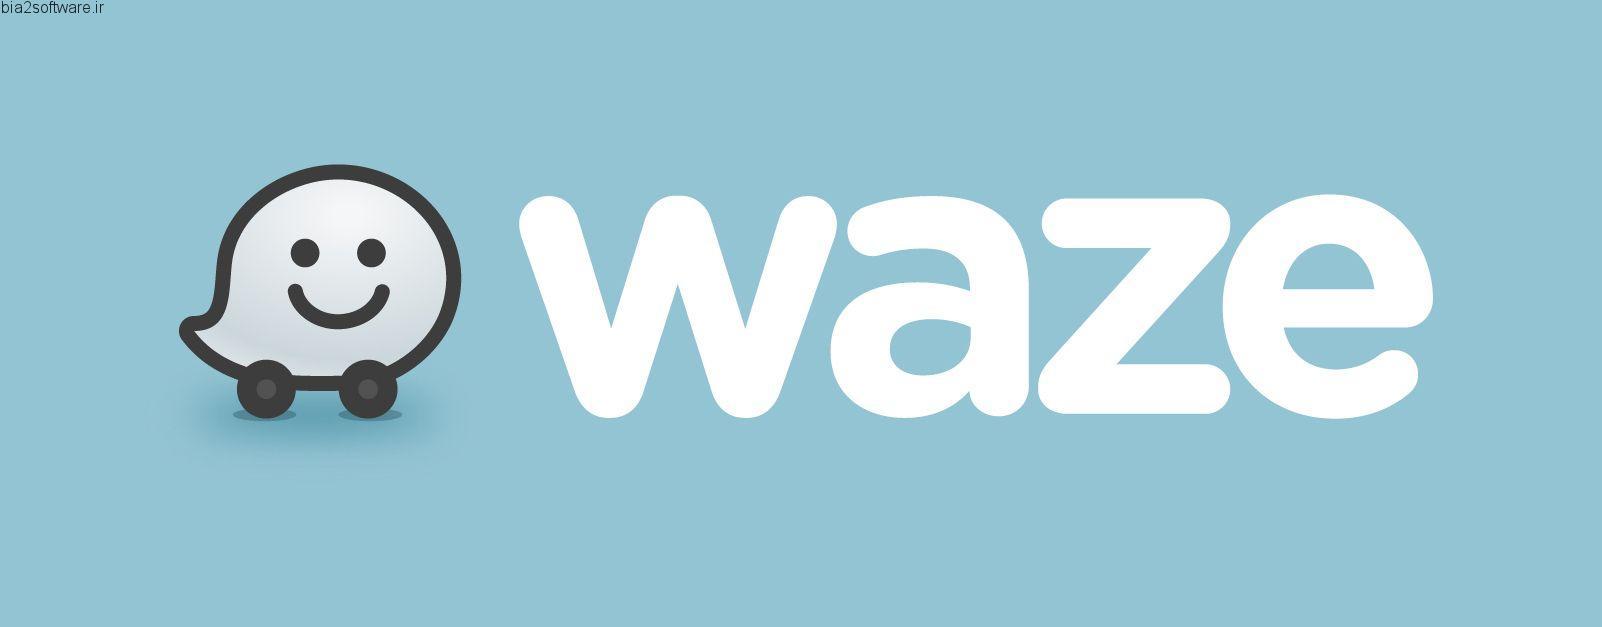 Waze 4.75.90.900 مسیریاب ویز اندروید